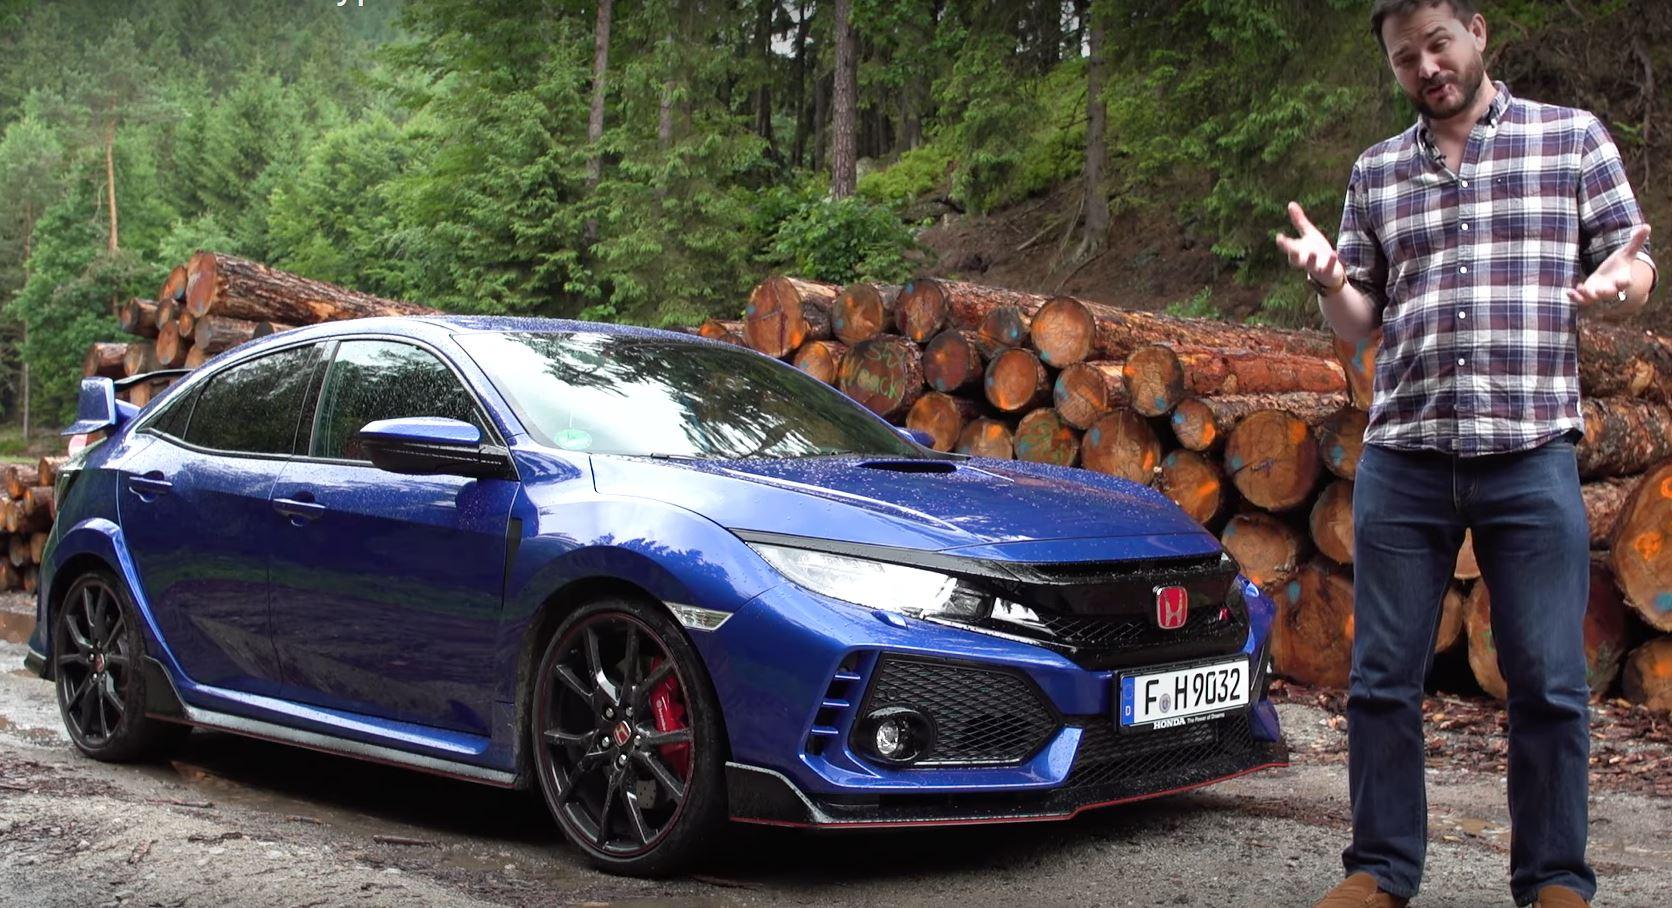 2018 Honda Civic Type R vs. Focus RS Review: One of Them Isn't Fun Enough - autoevolution